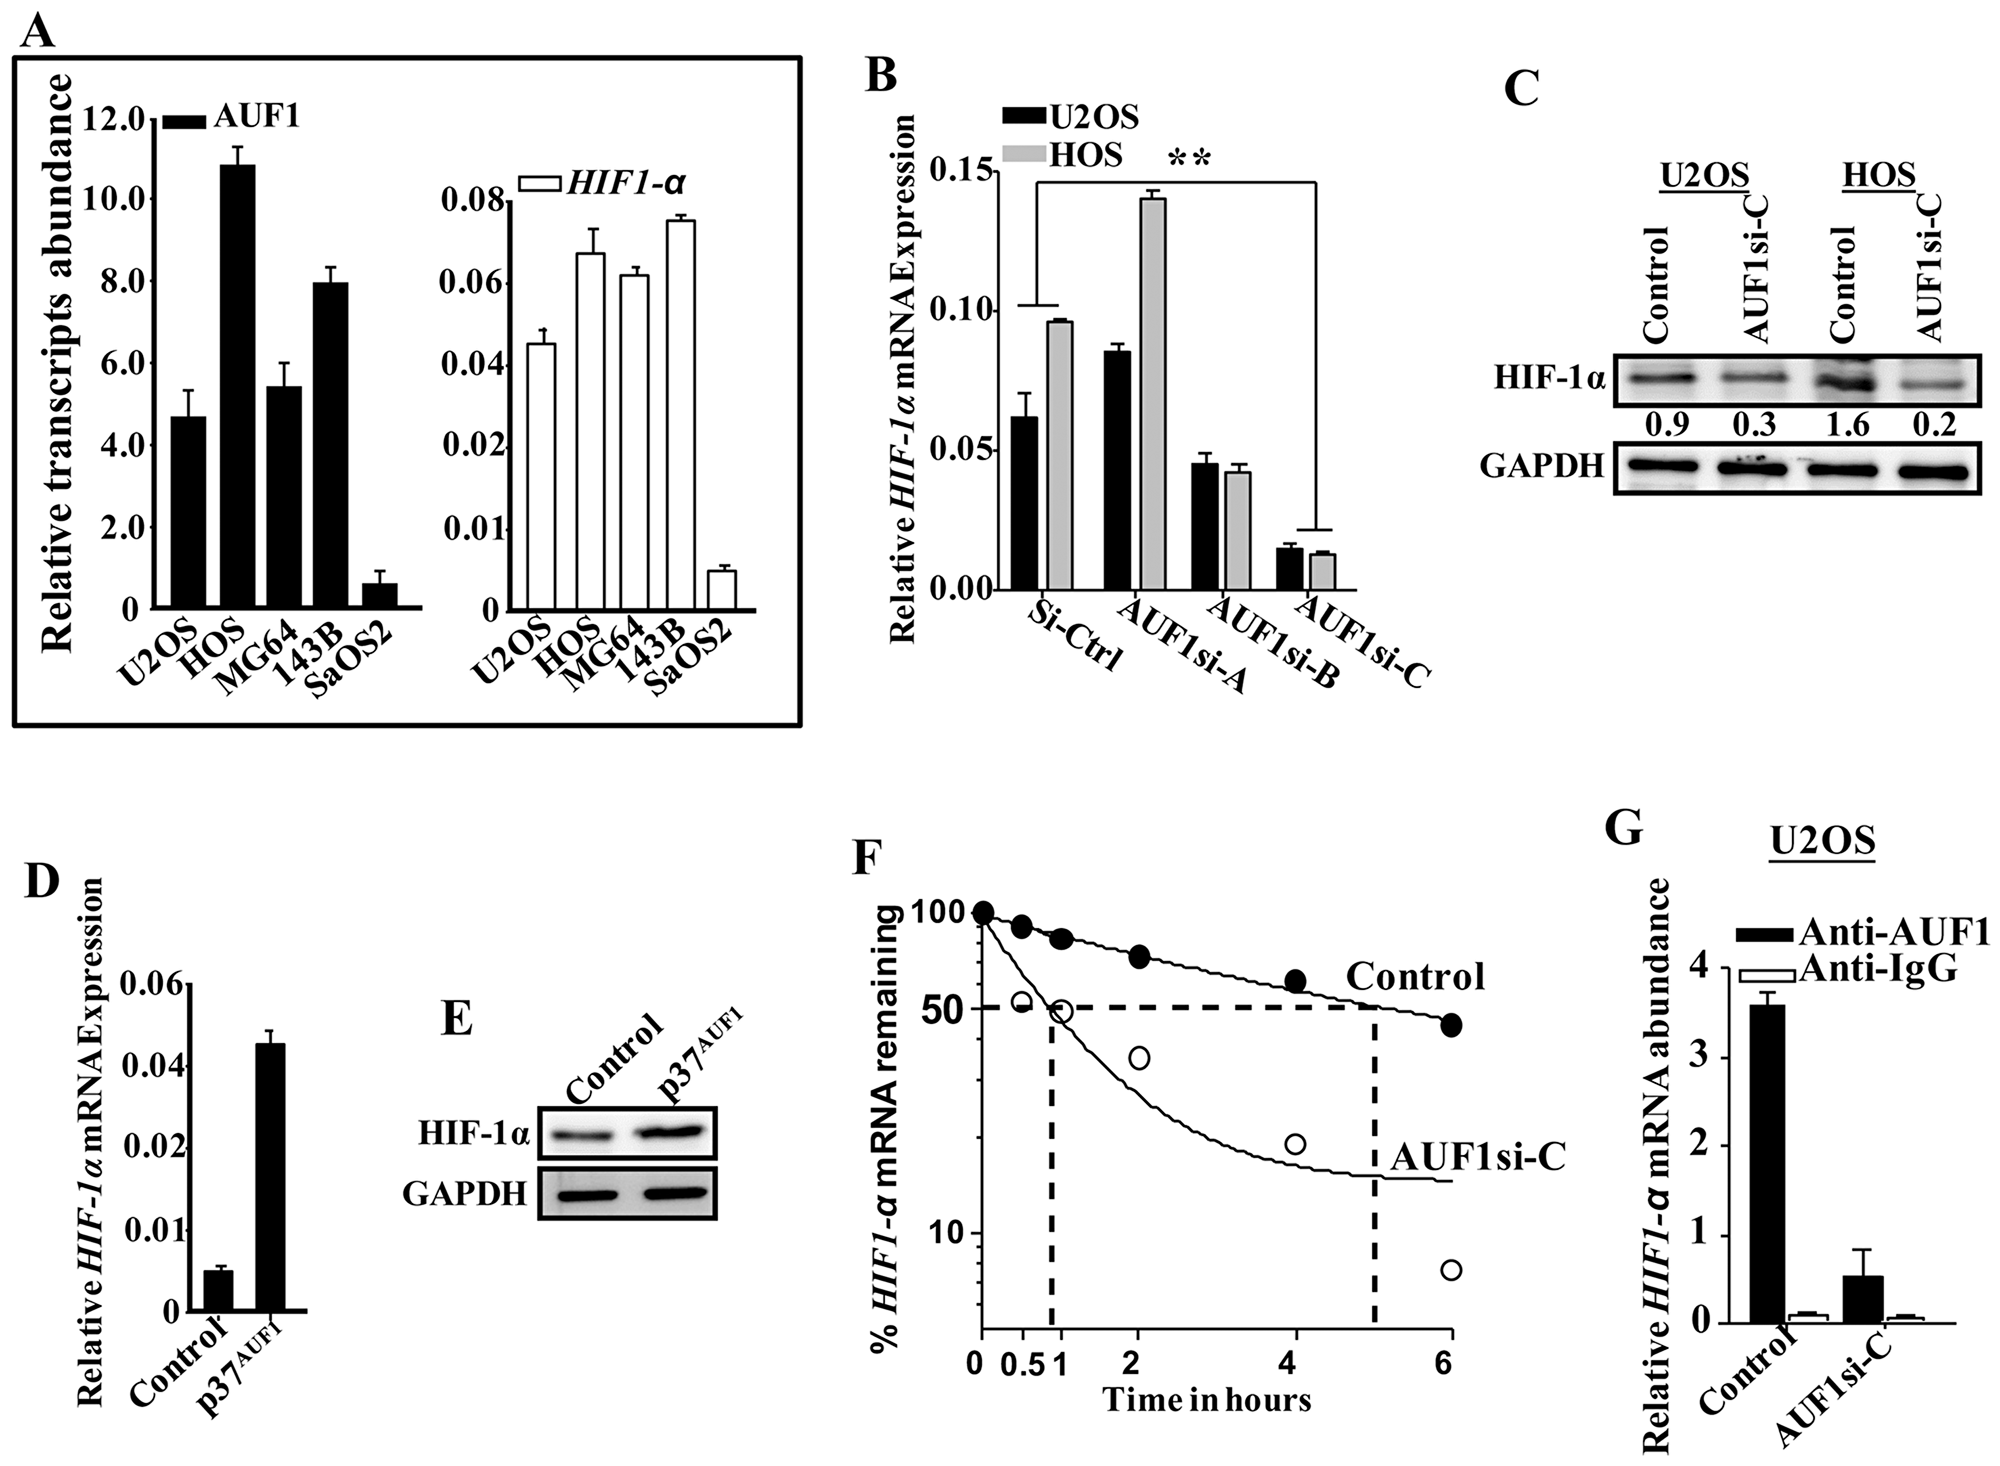 AUF1 stabilizes the HIF-1α mRNA.